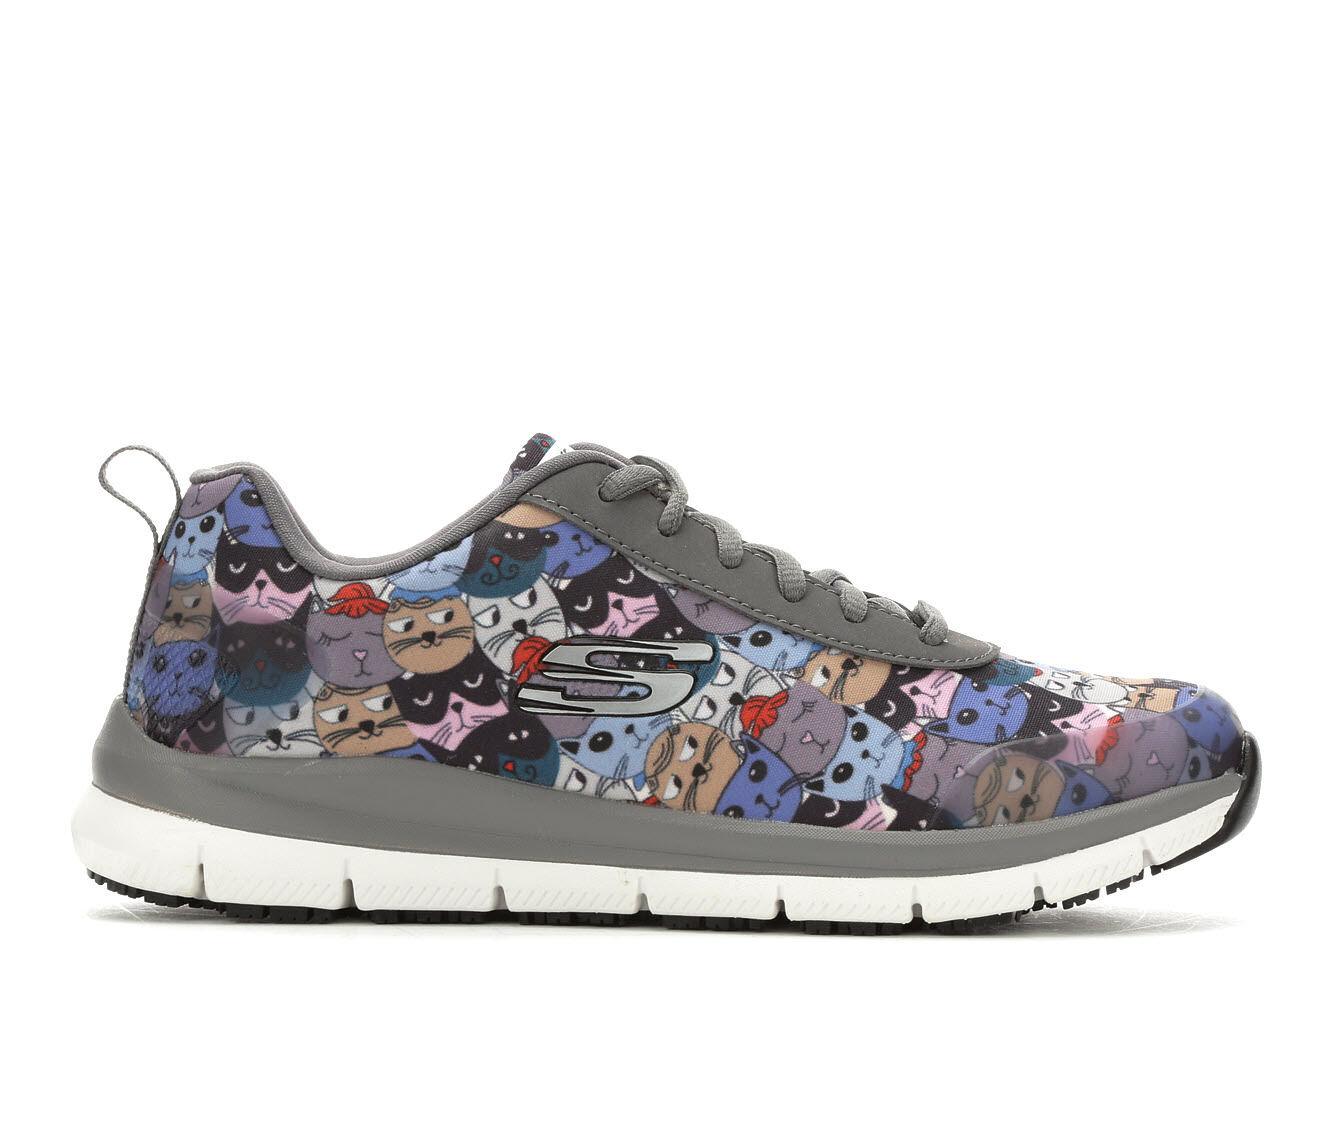 Women's SKECHERS HEALTH Scatchey 77249 Safety Shoes Blue/Grey/Cat